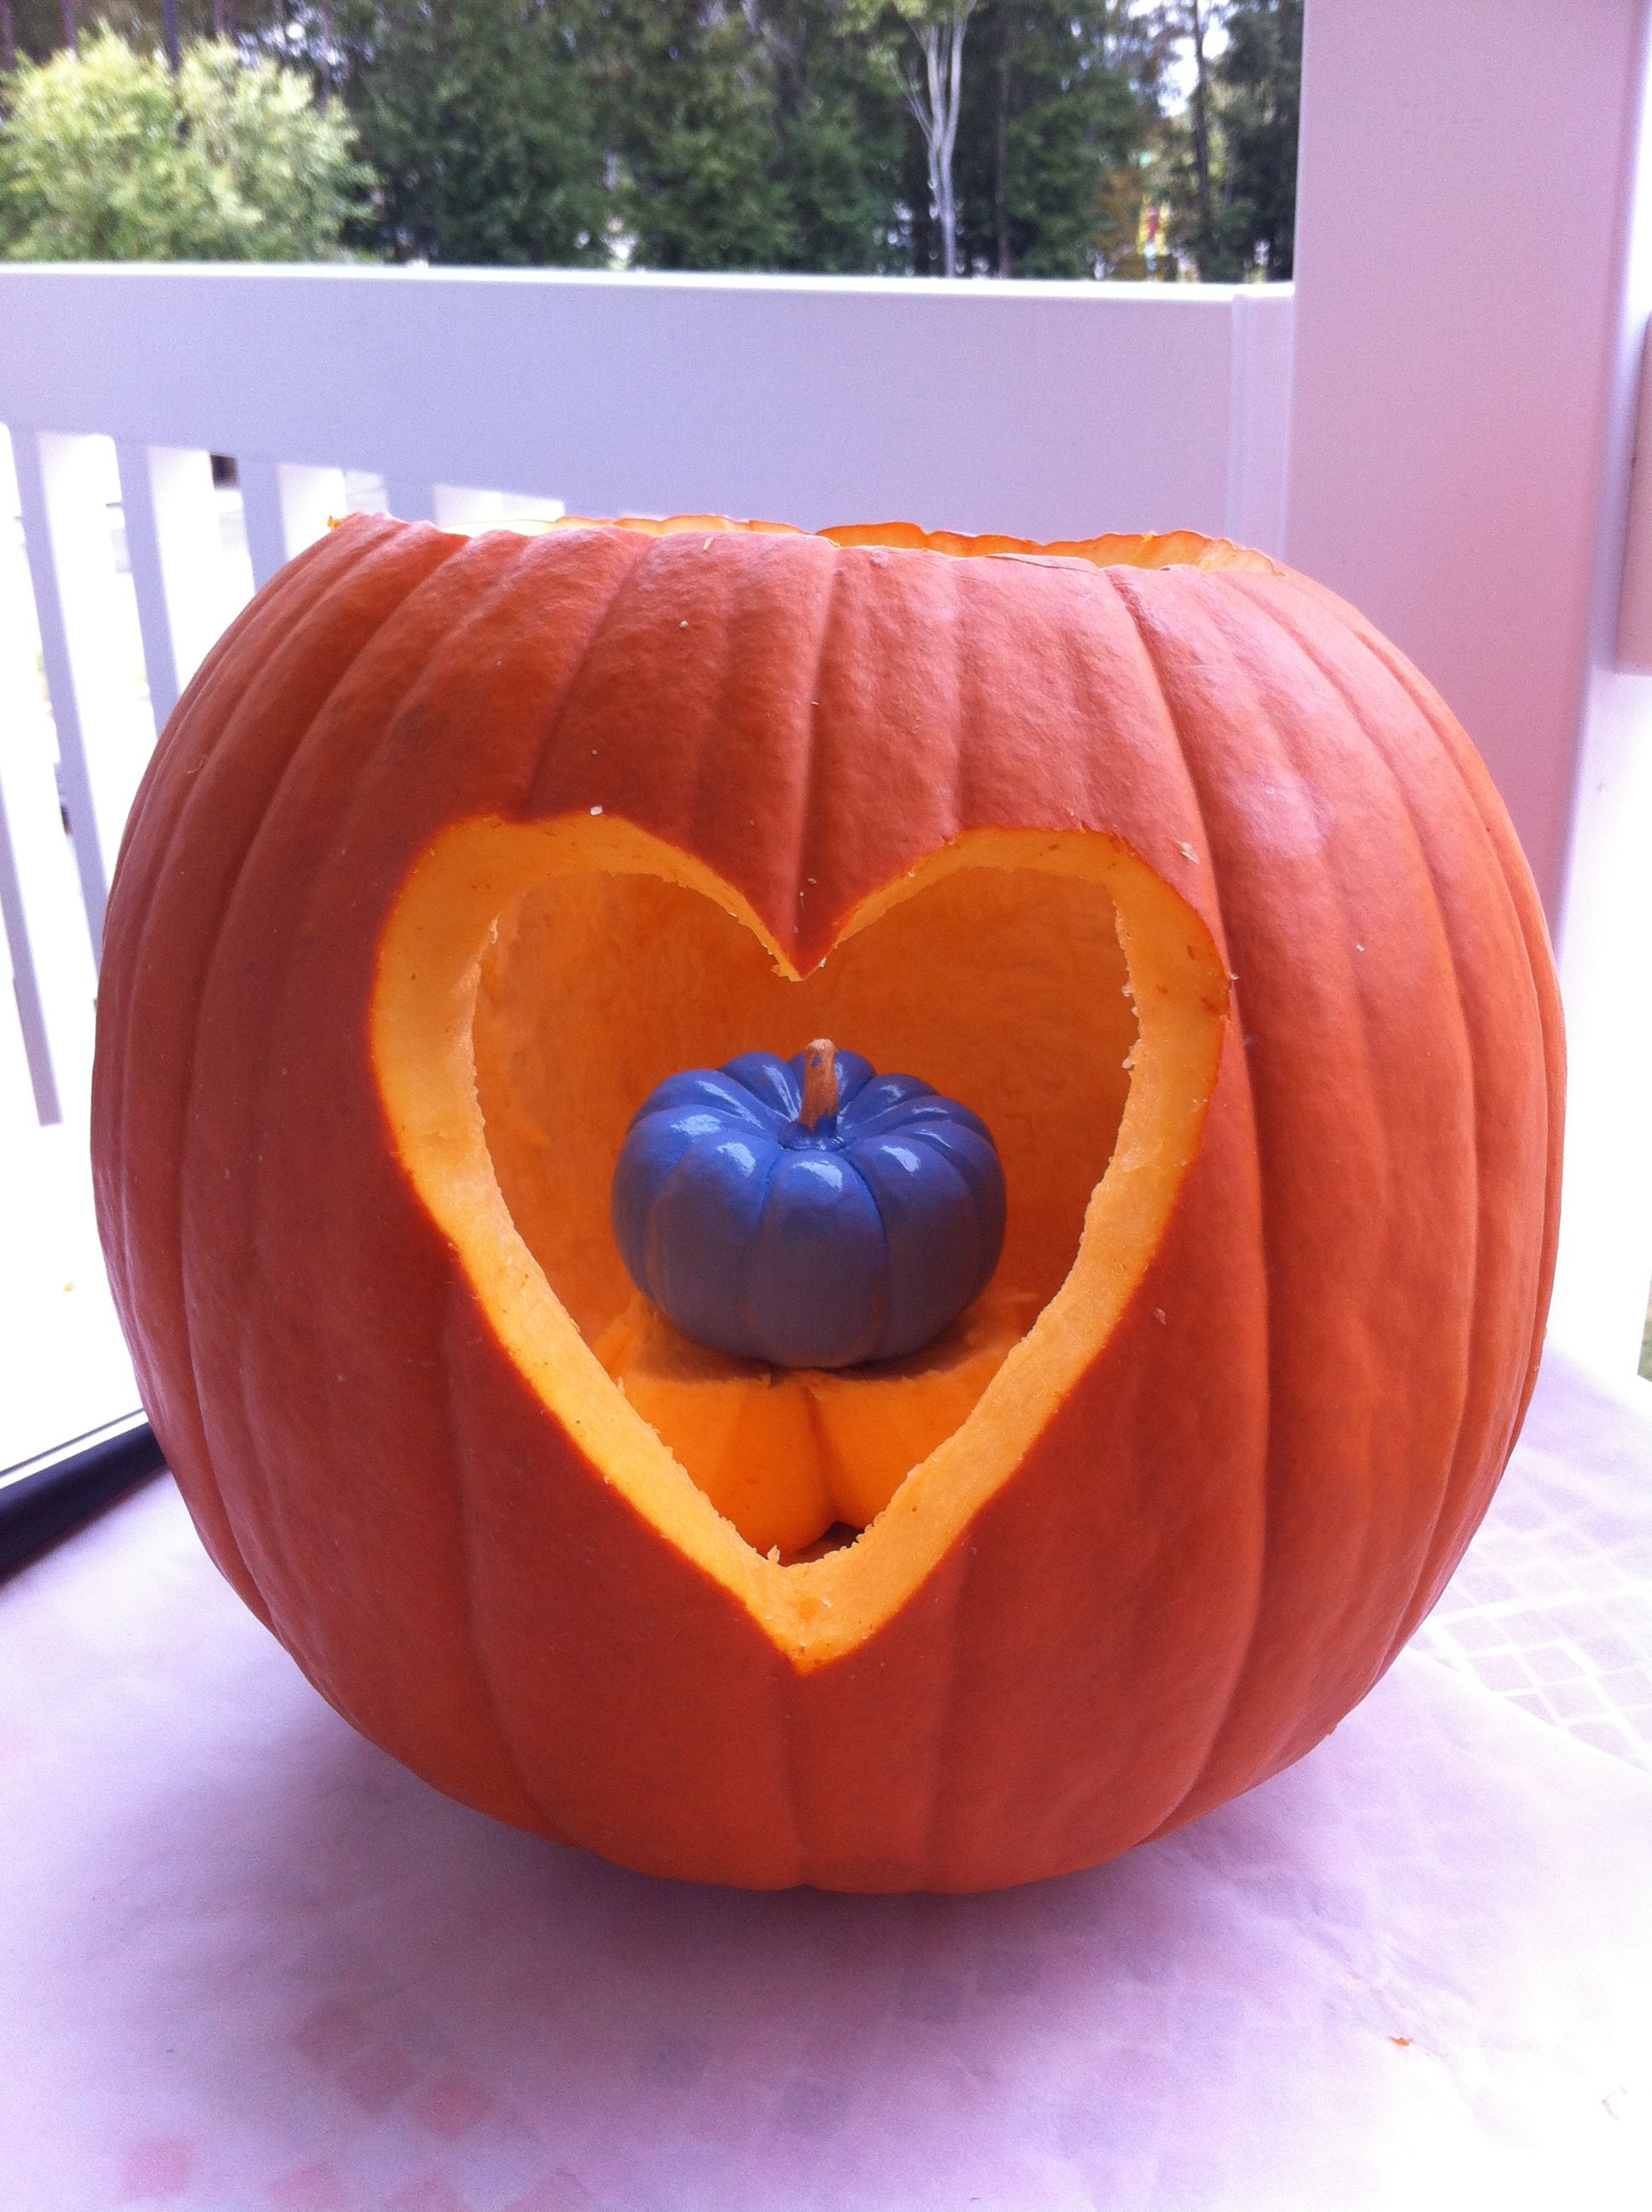 Gender reveal pumpkin | Future design | Pinterest | Gender reveal ...